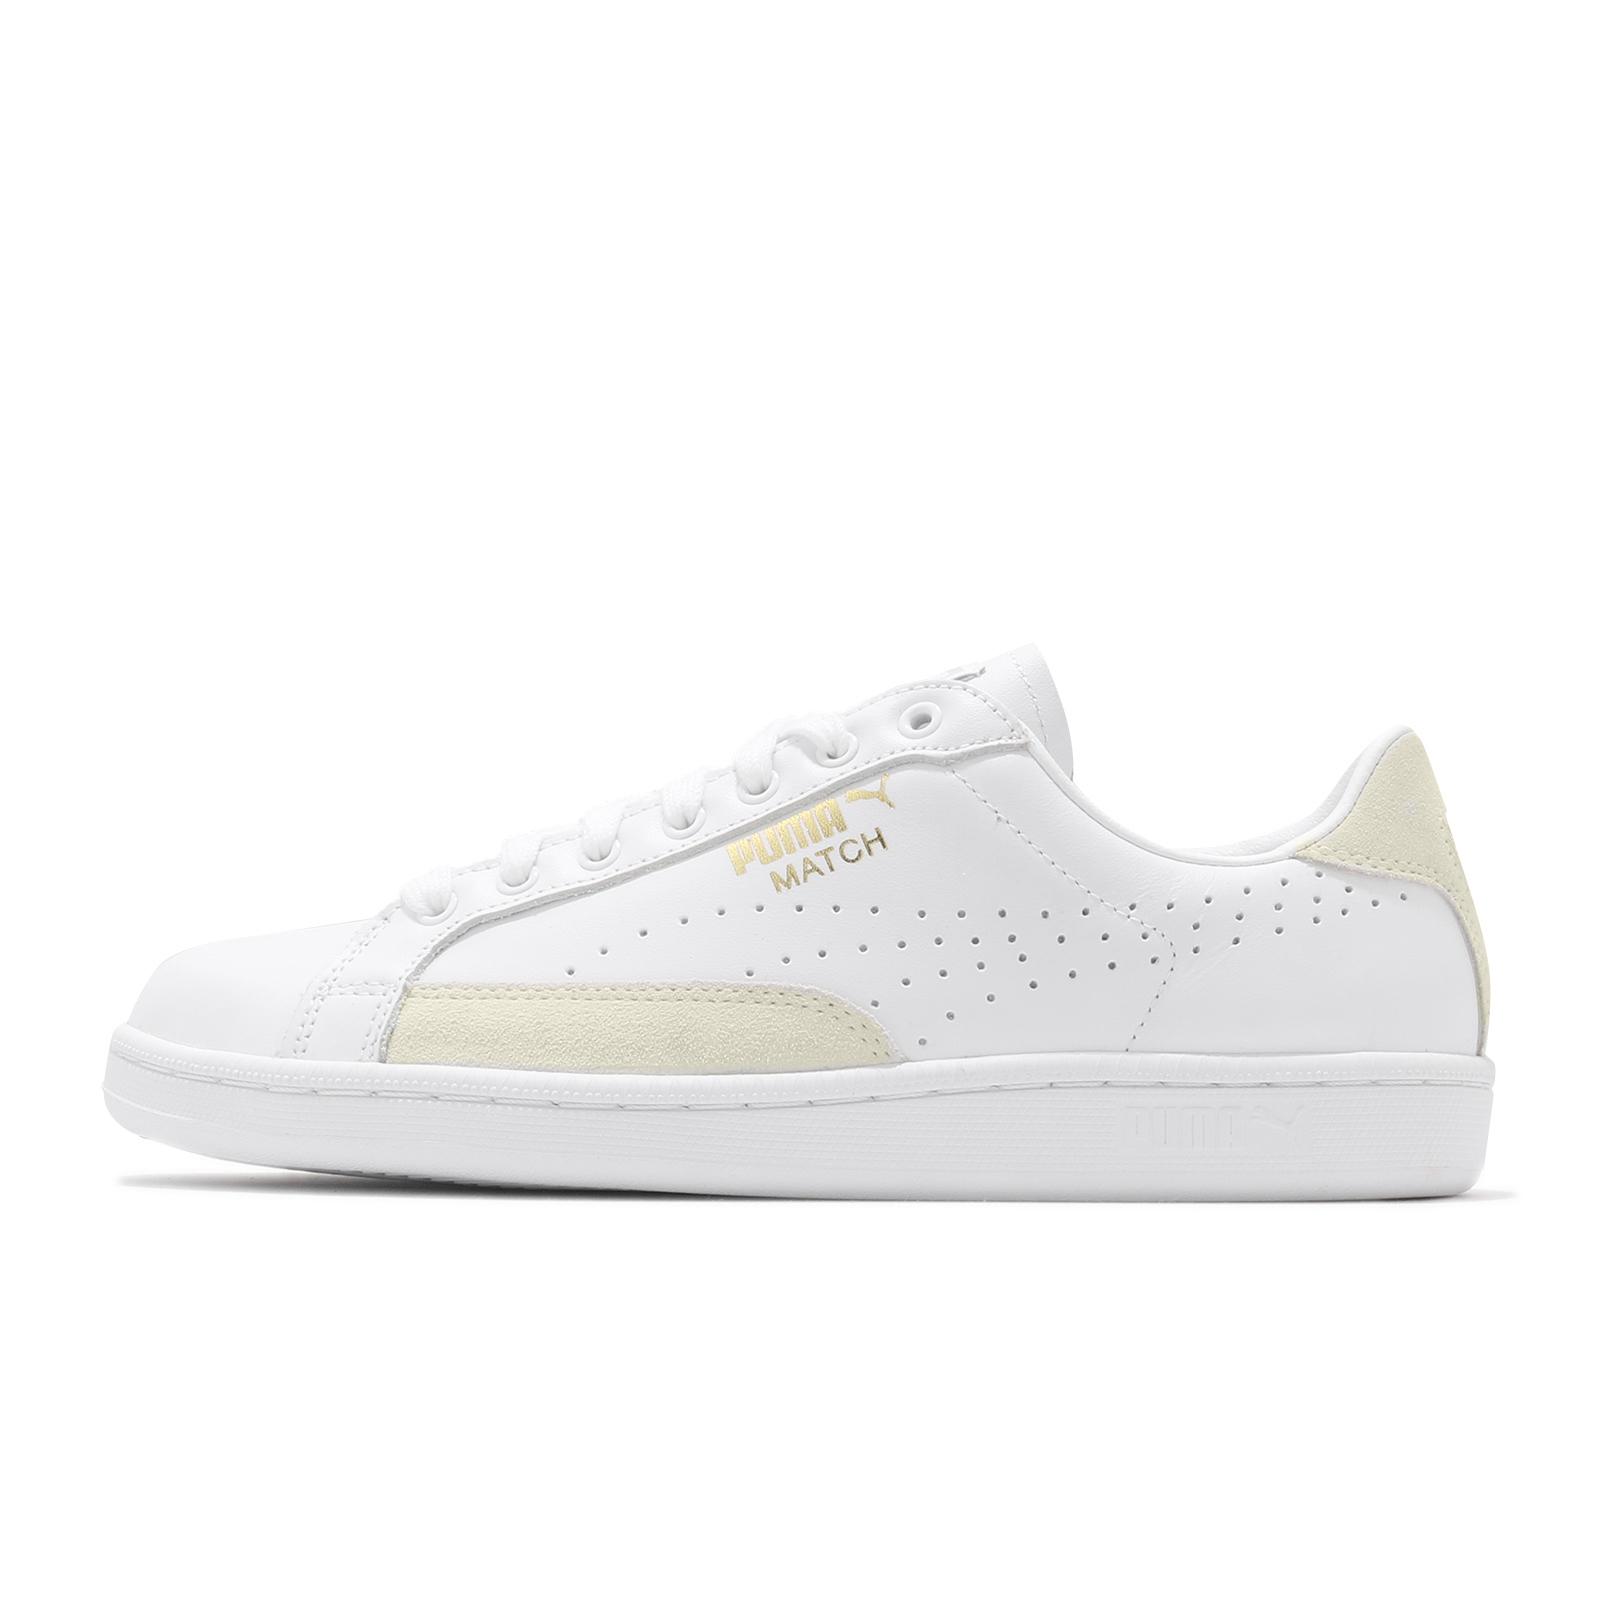 Puma 休閒鞋 Match 74 UPC 男鞋 白 米 基本款 板鞋 彪馬 運動鞋 【ACS】 359518-10